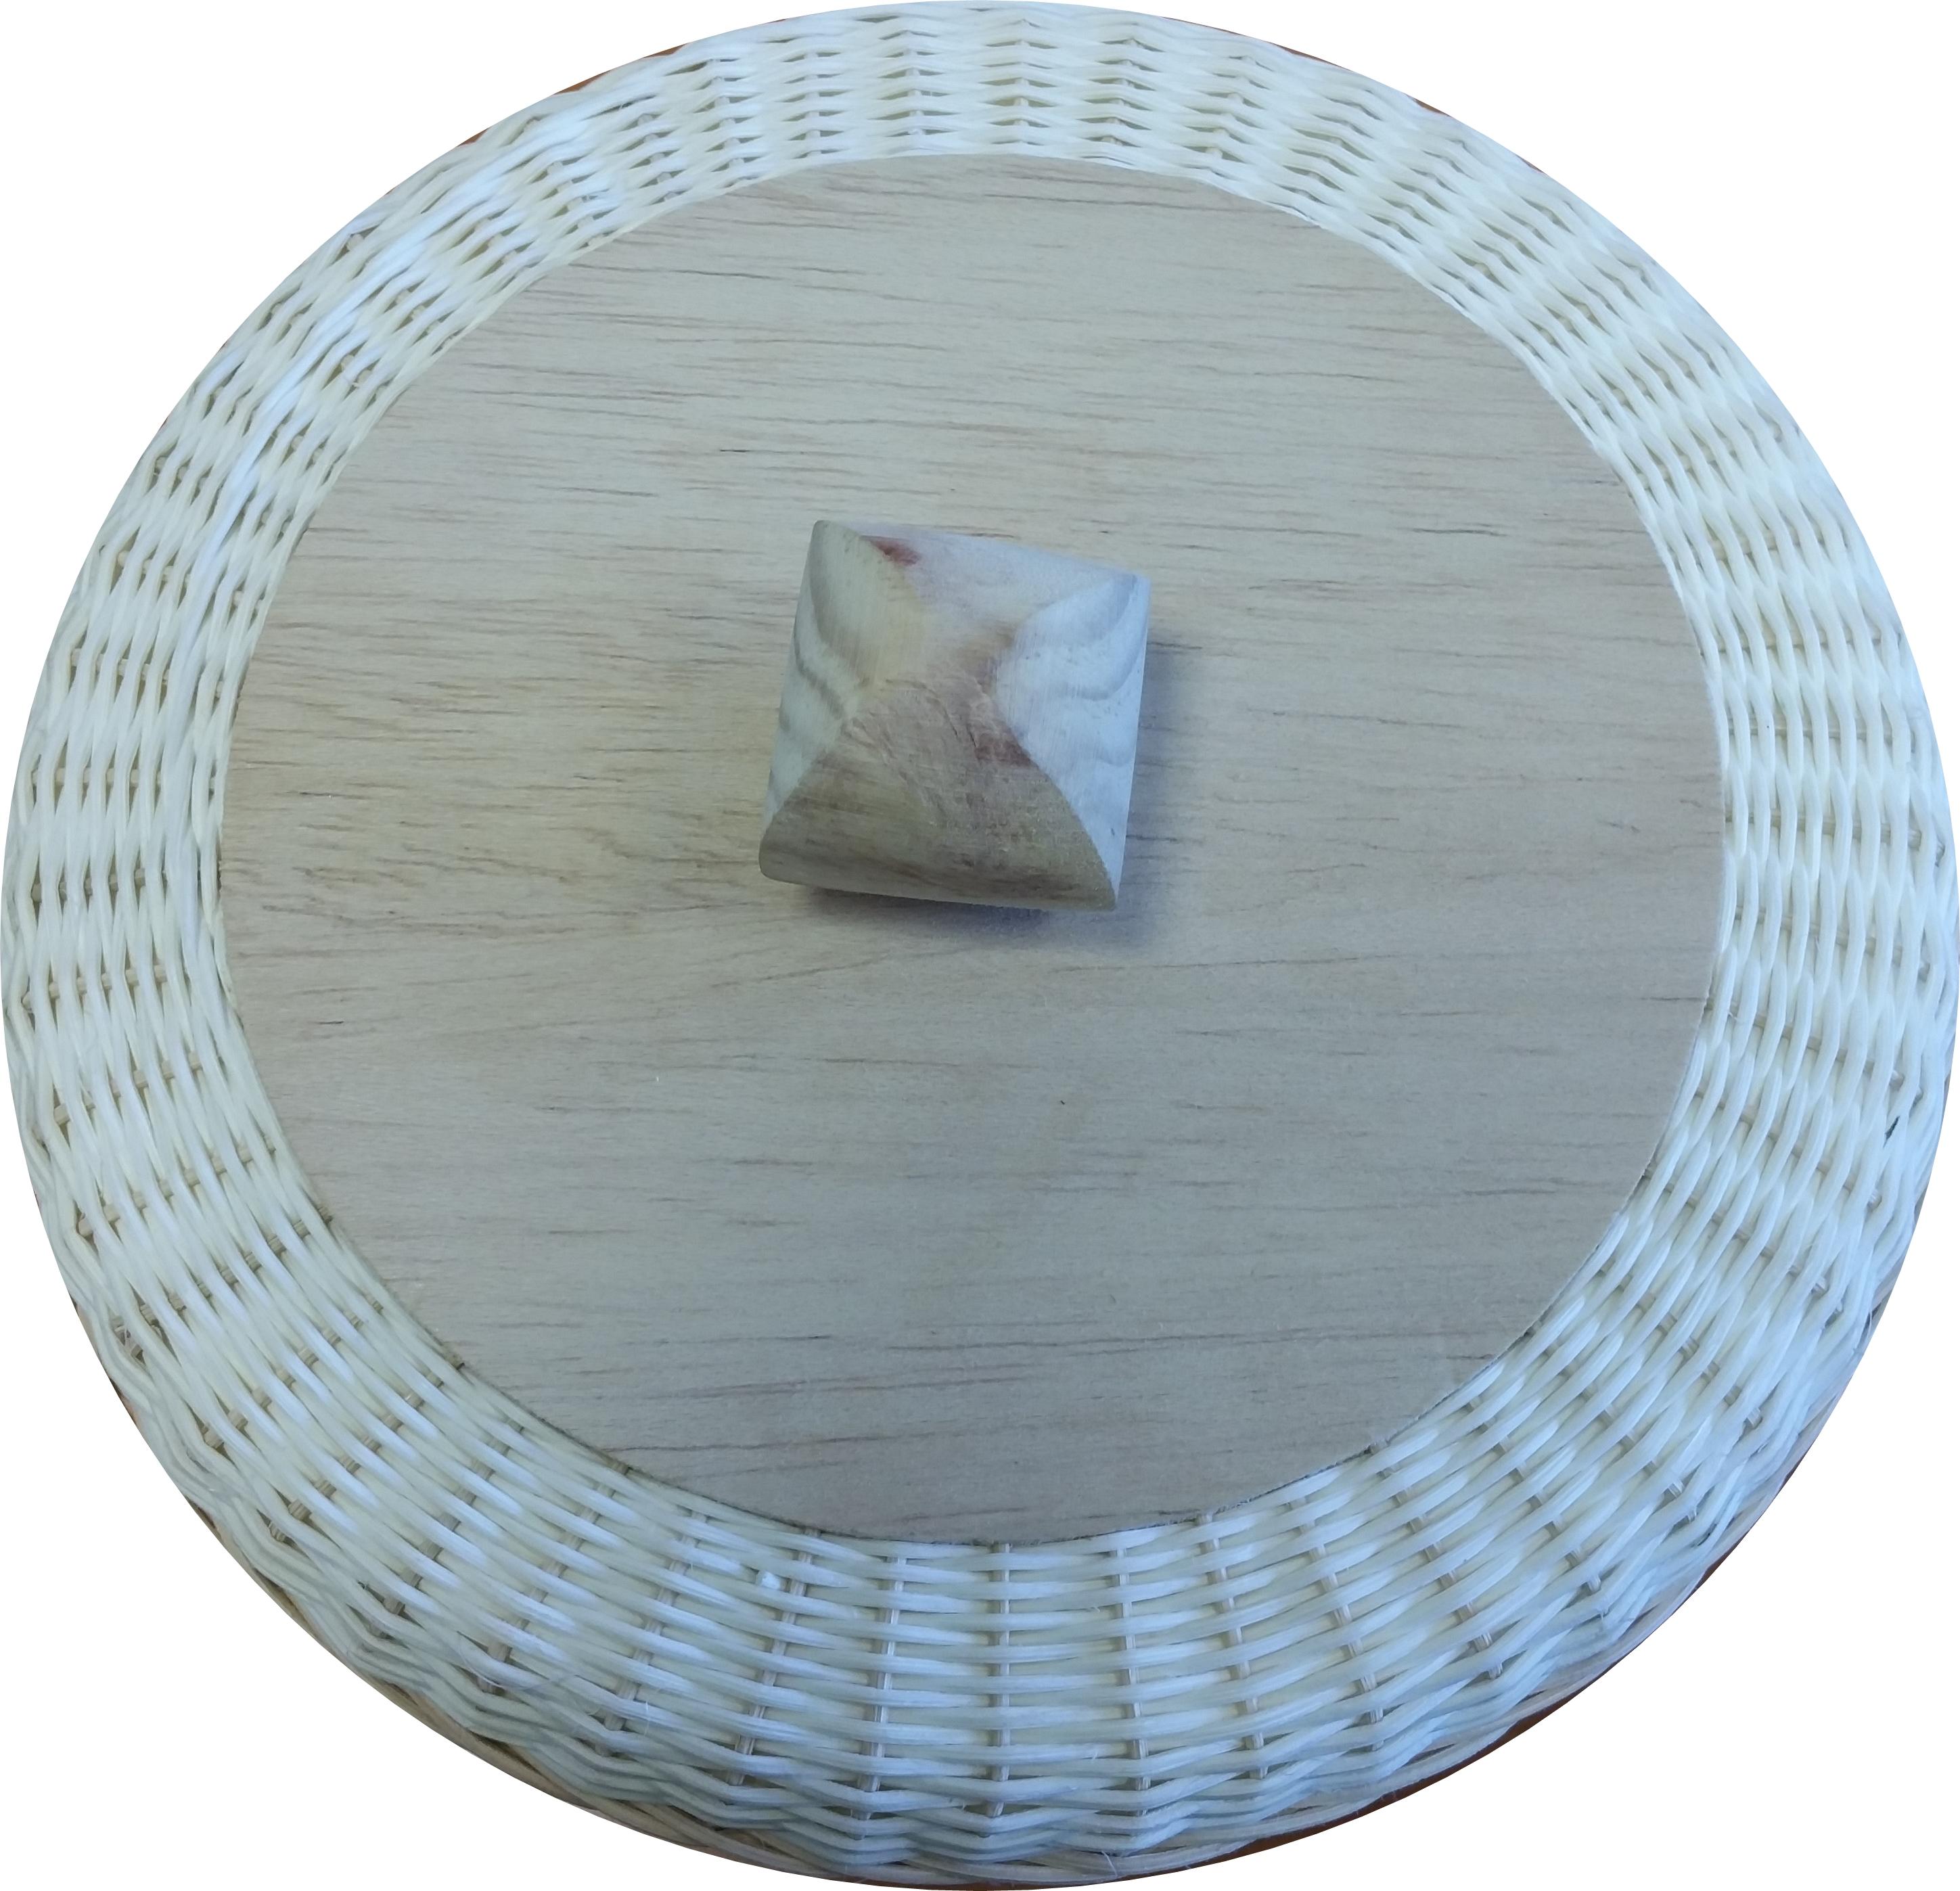 Tortilleros Unicel 9cm (aprox) 20cm (GRANDE)